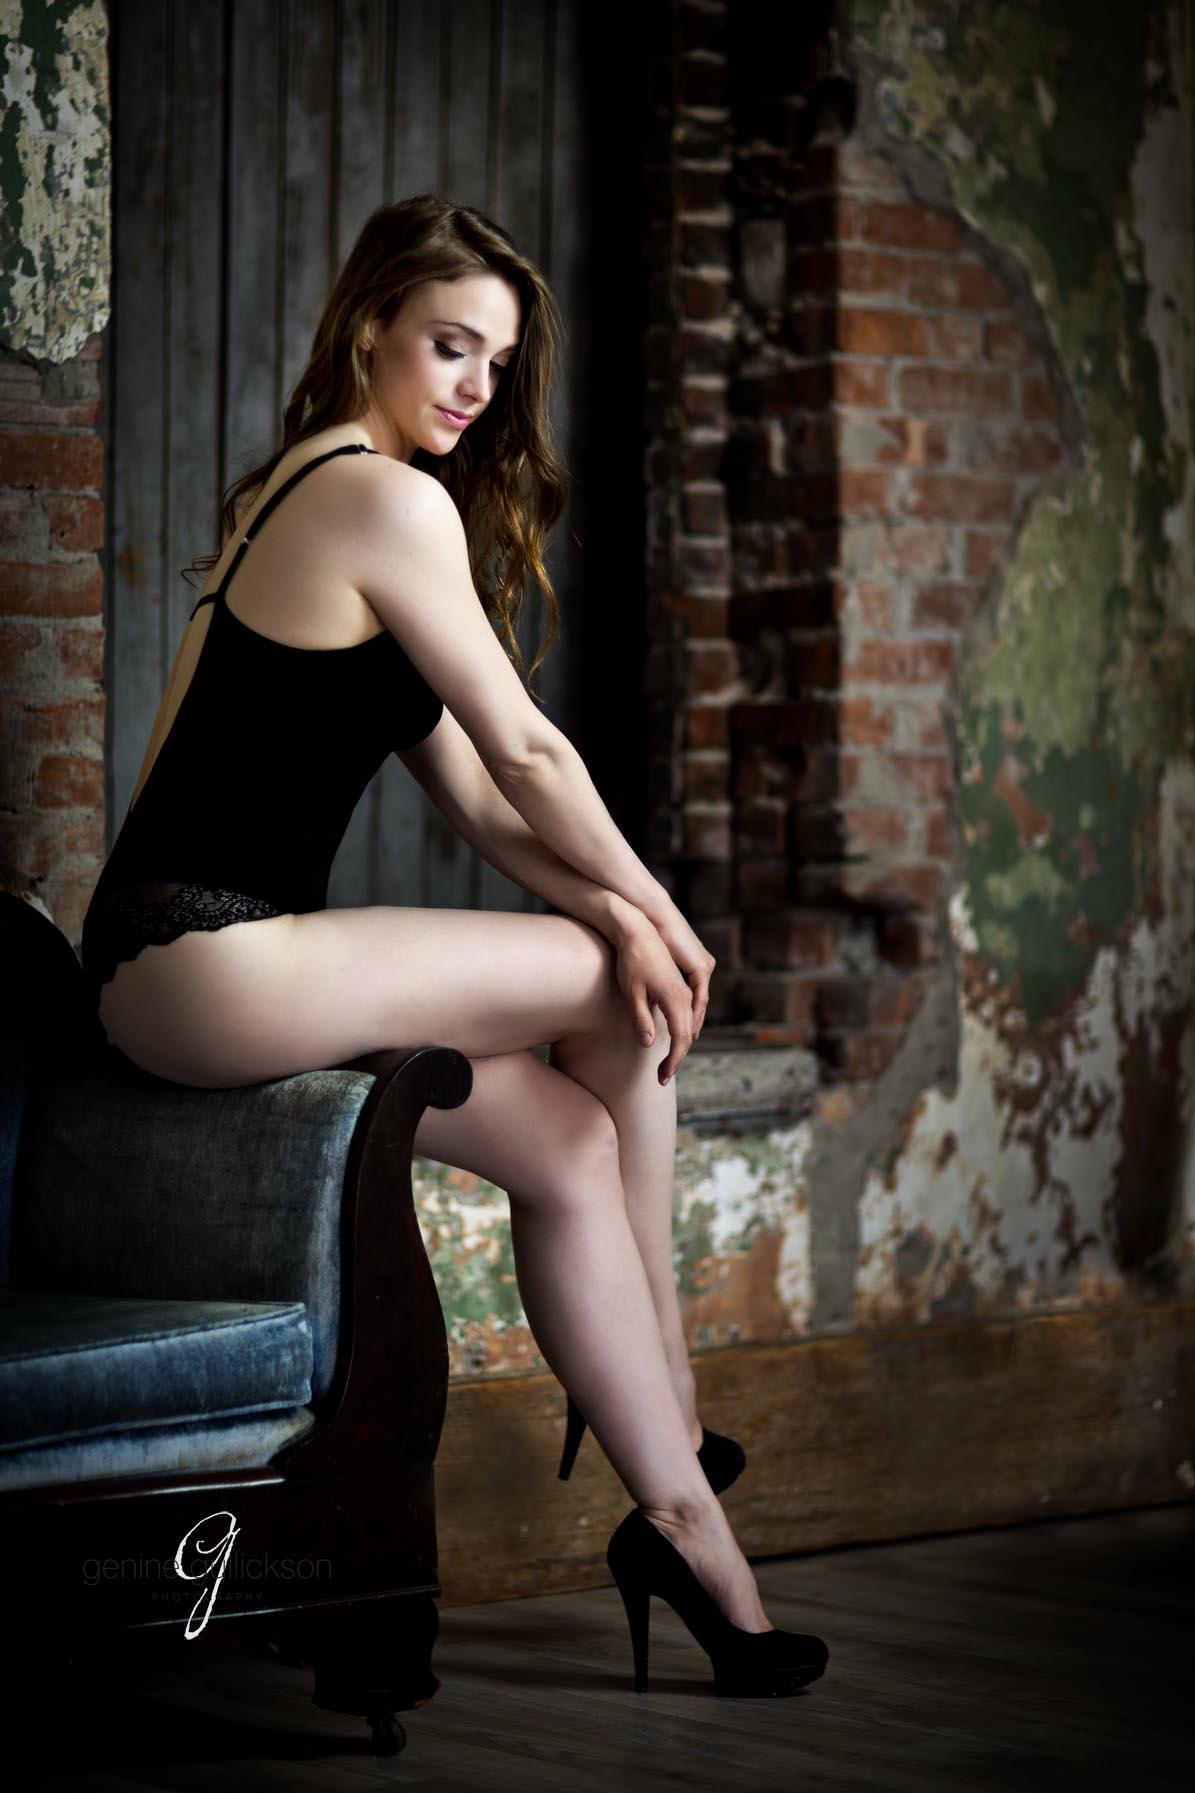 Erotic photography workshop